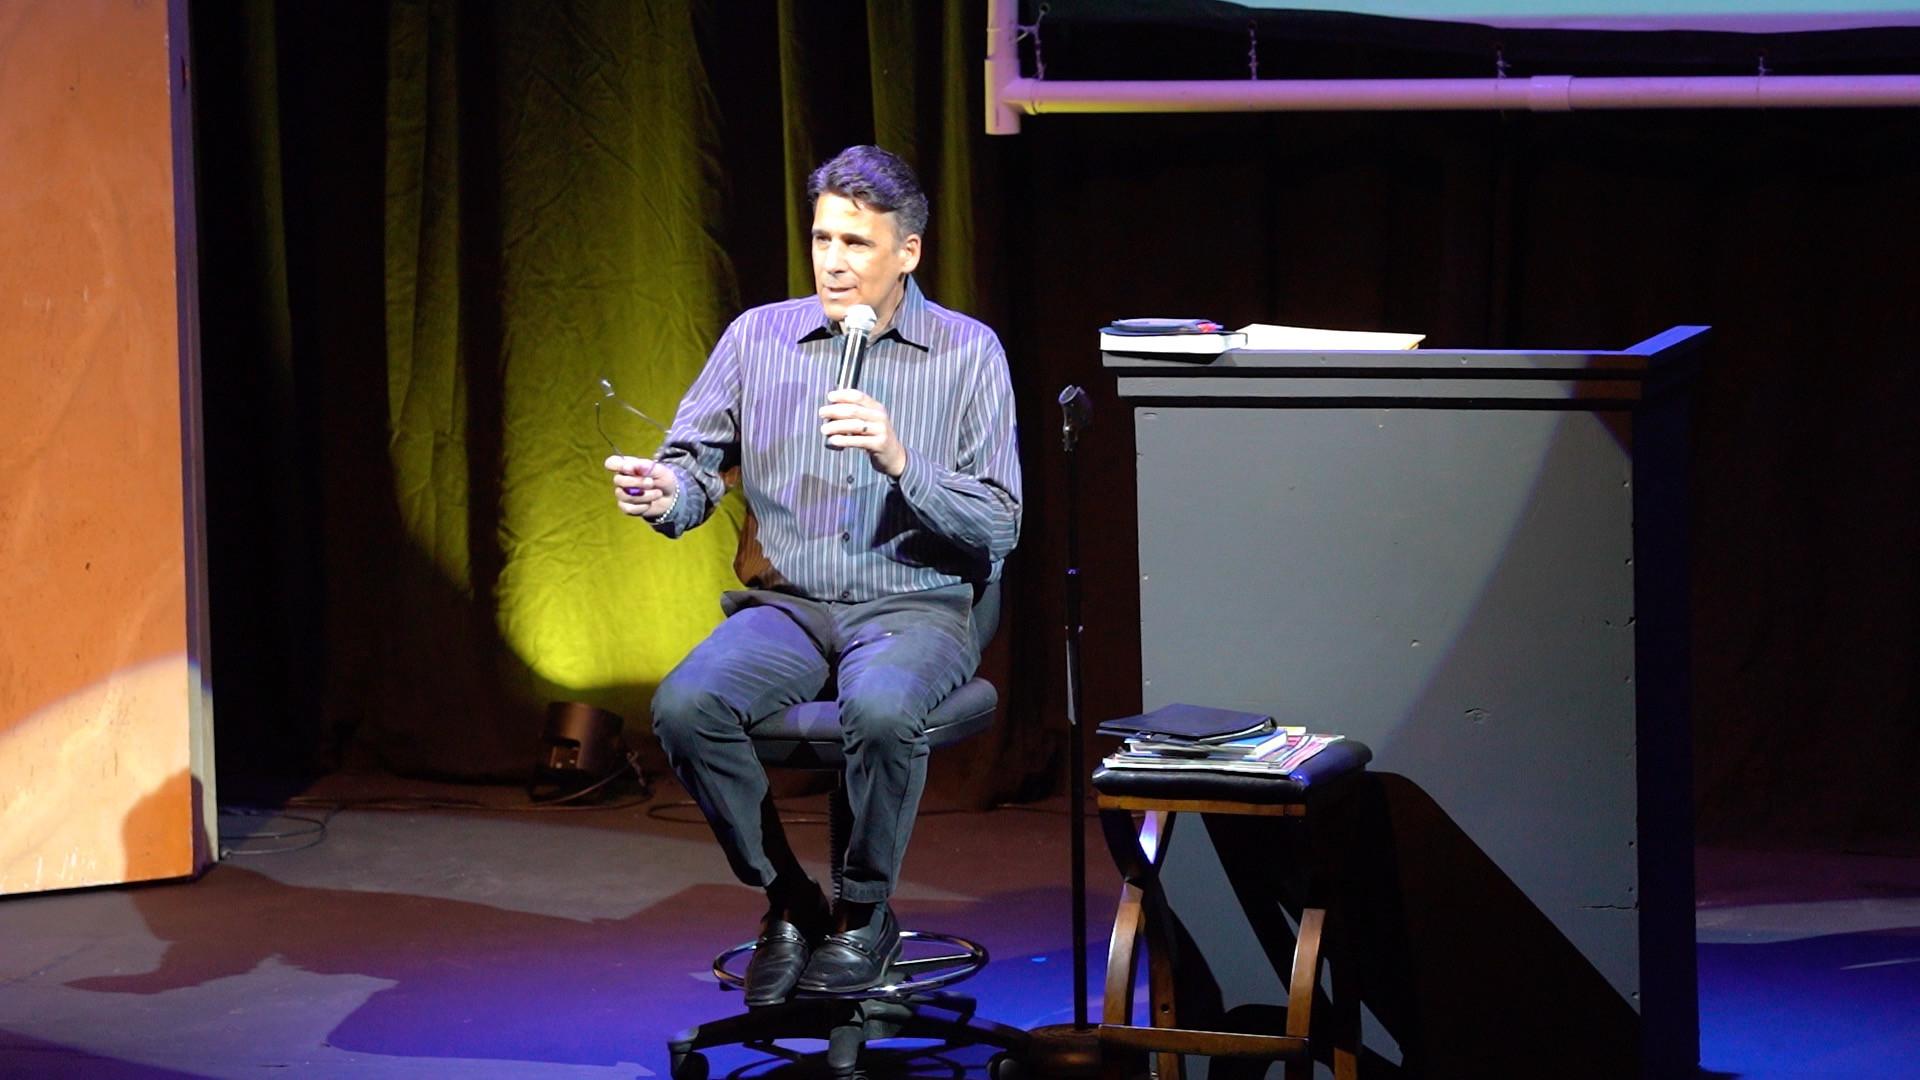 Wayne Scott Conference Talk